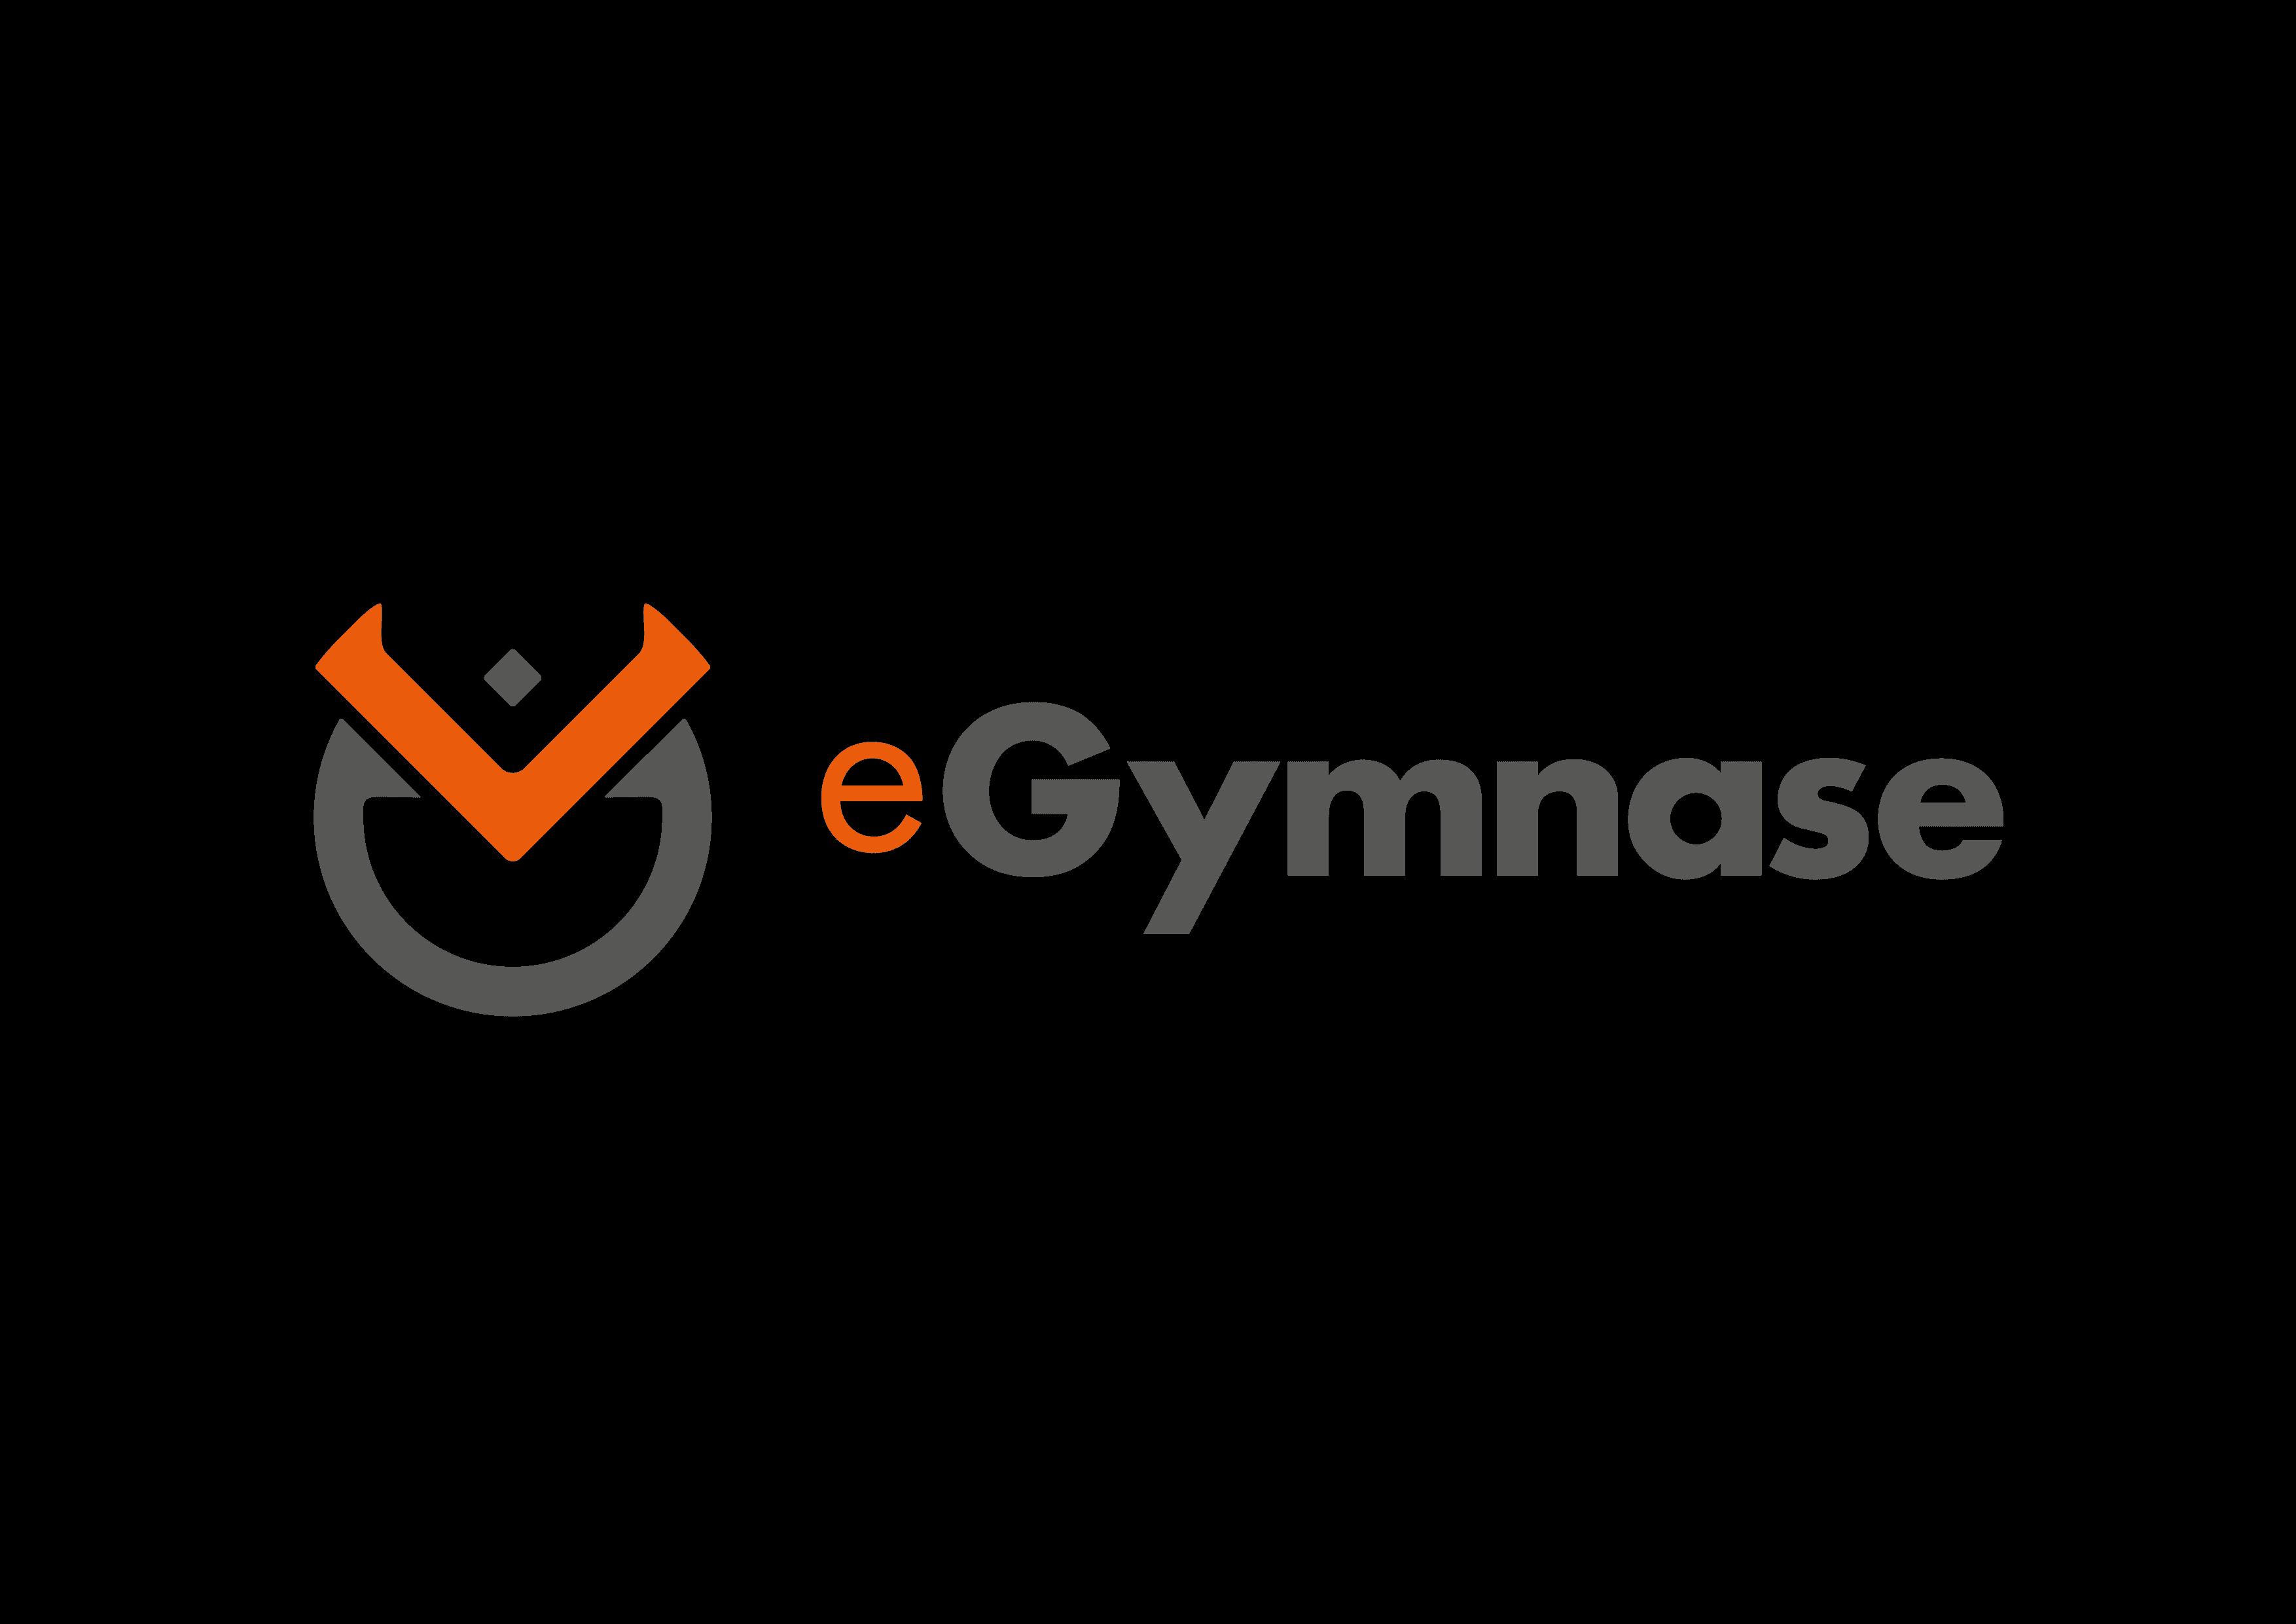 eGymnase – 2018